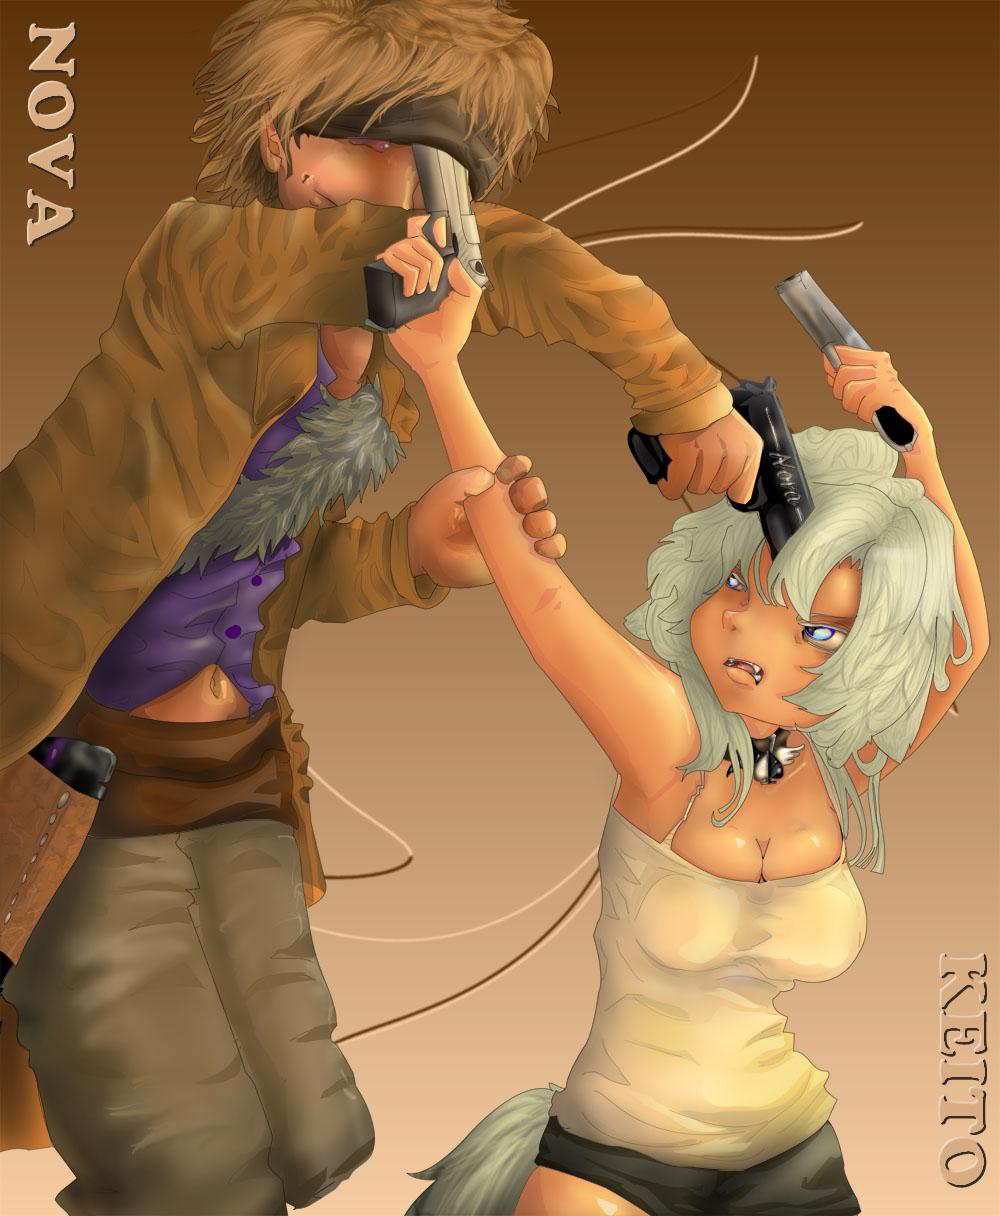 Nova and Keito